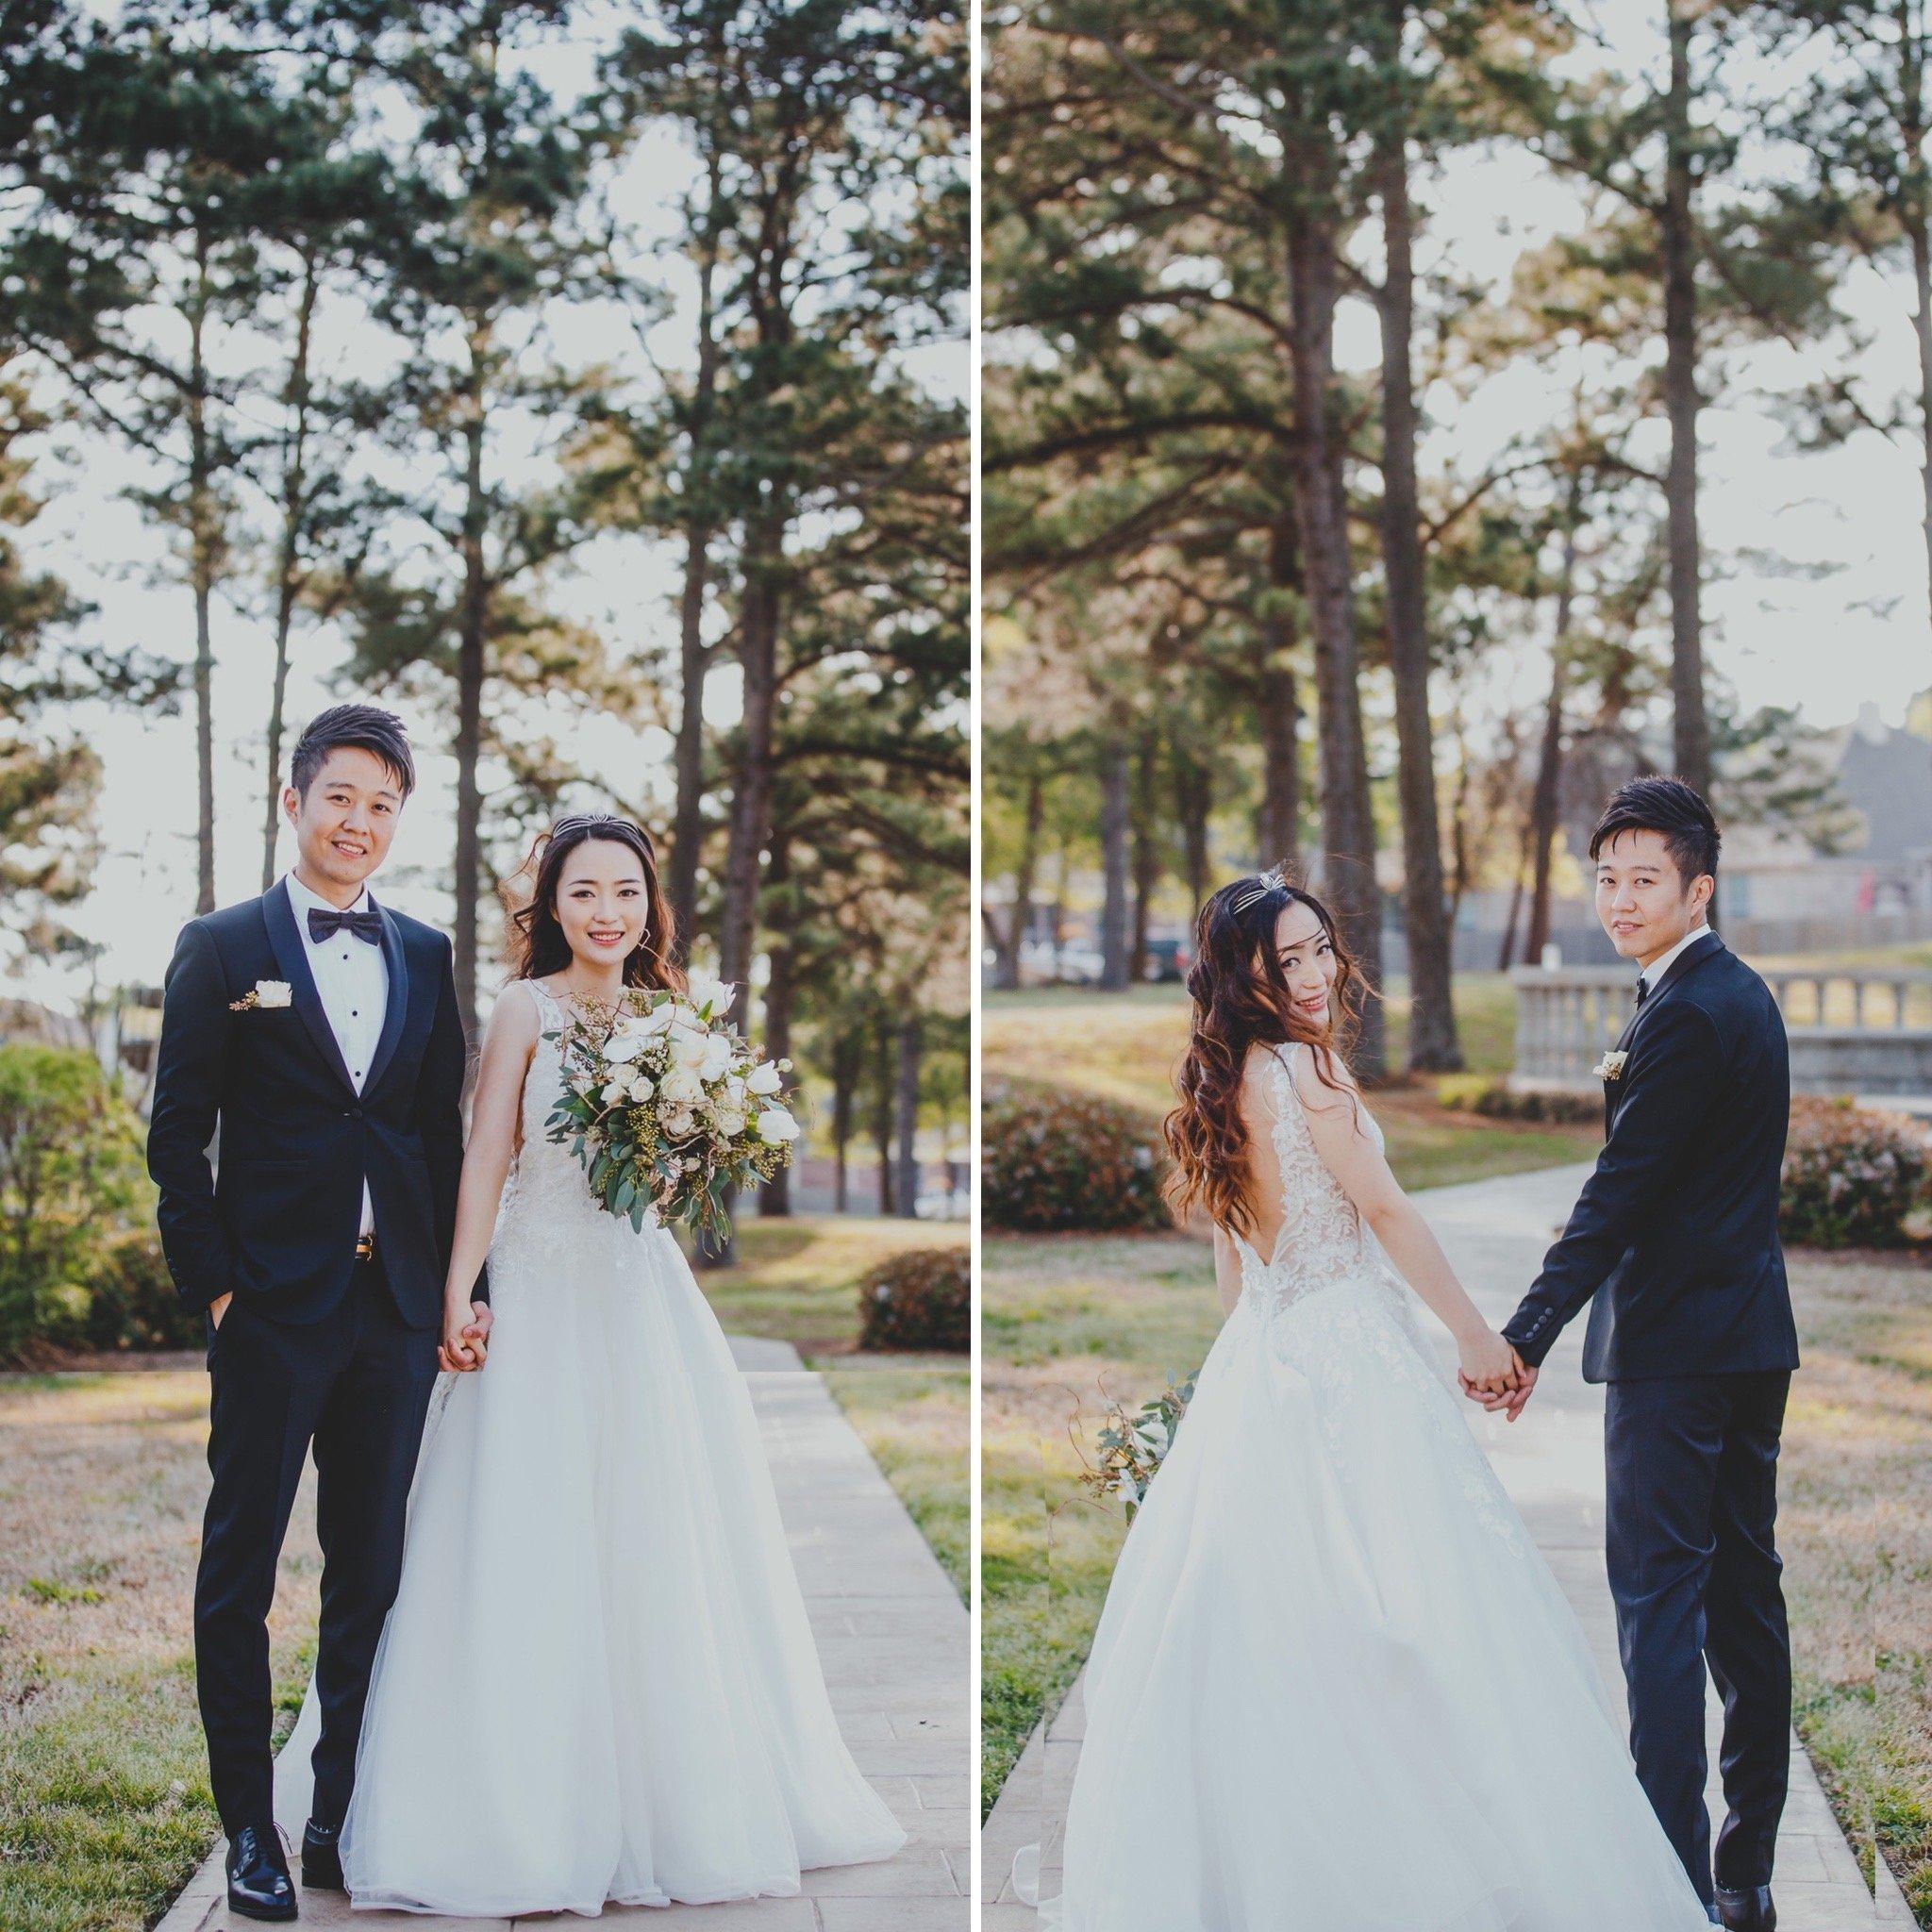 Wedding-Photography-PlayShoot-Studio-休斯顿婚礼摄影